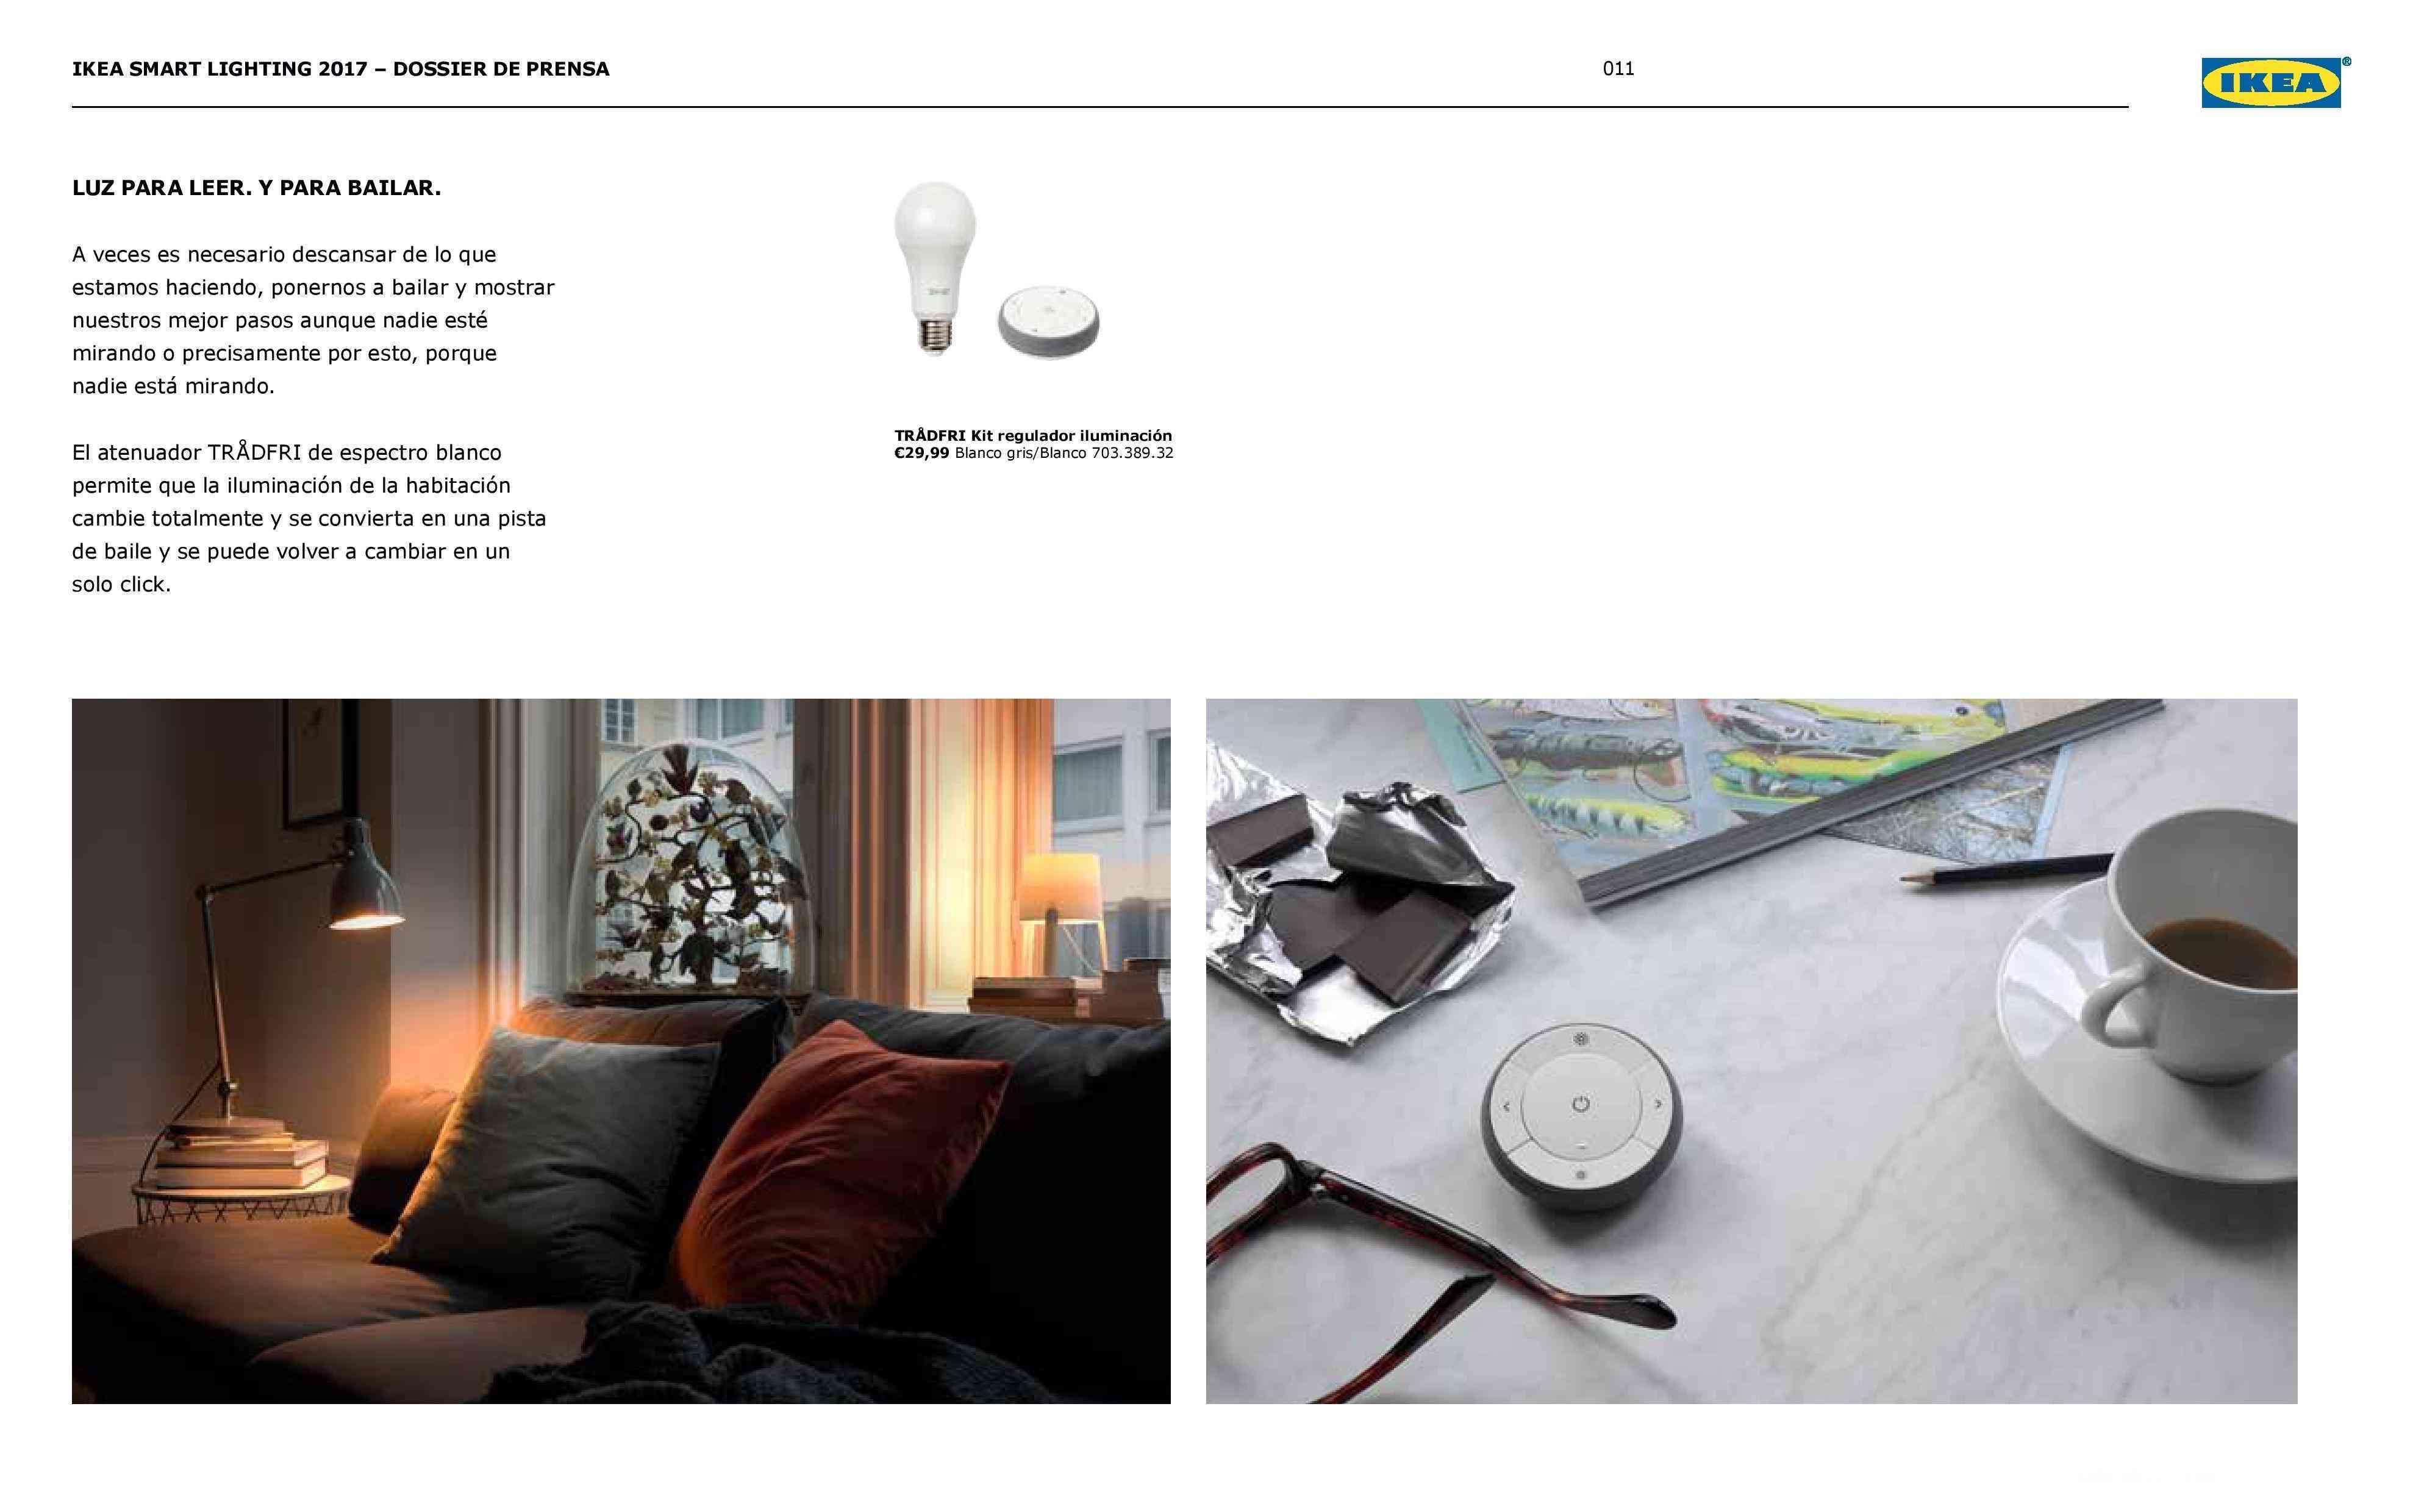 Novedades en iluminación de casas inteligentes con IKEA 67